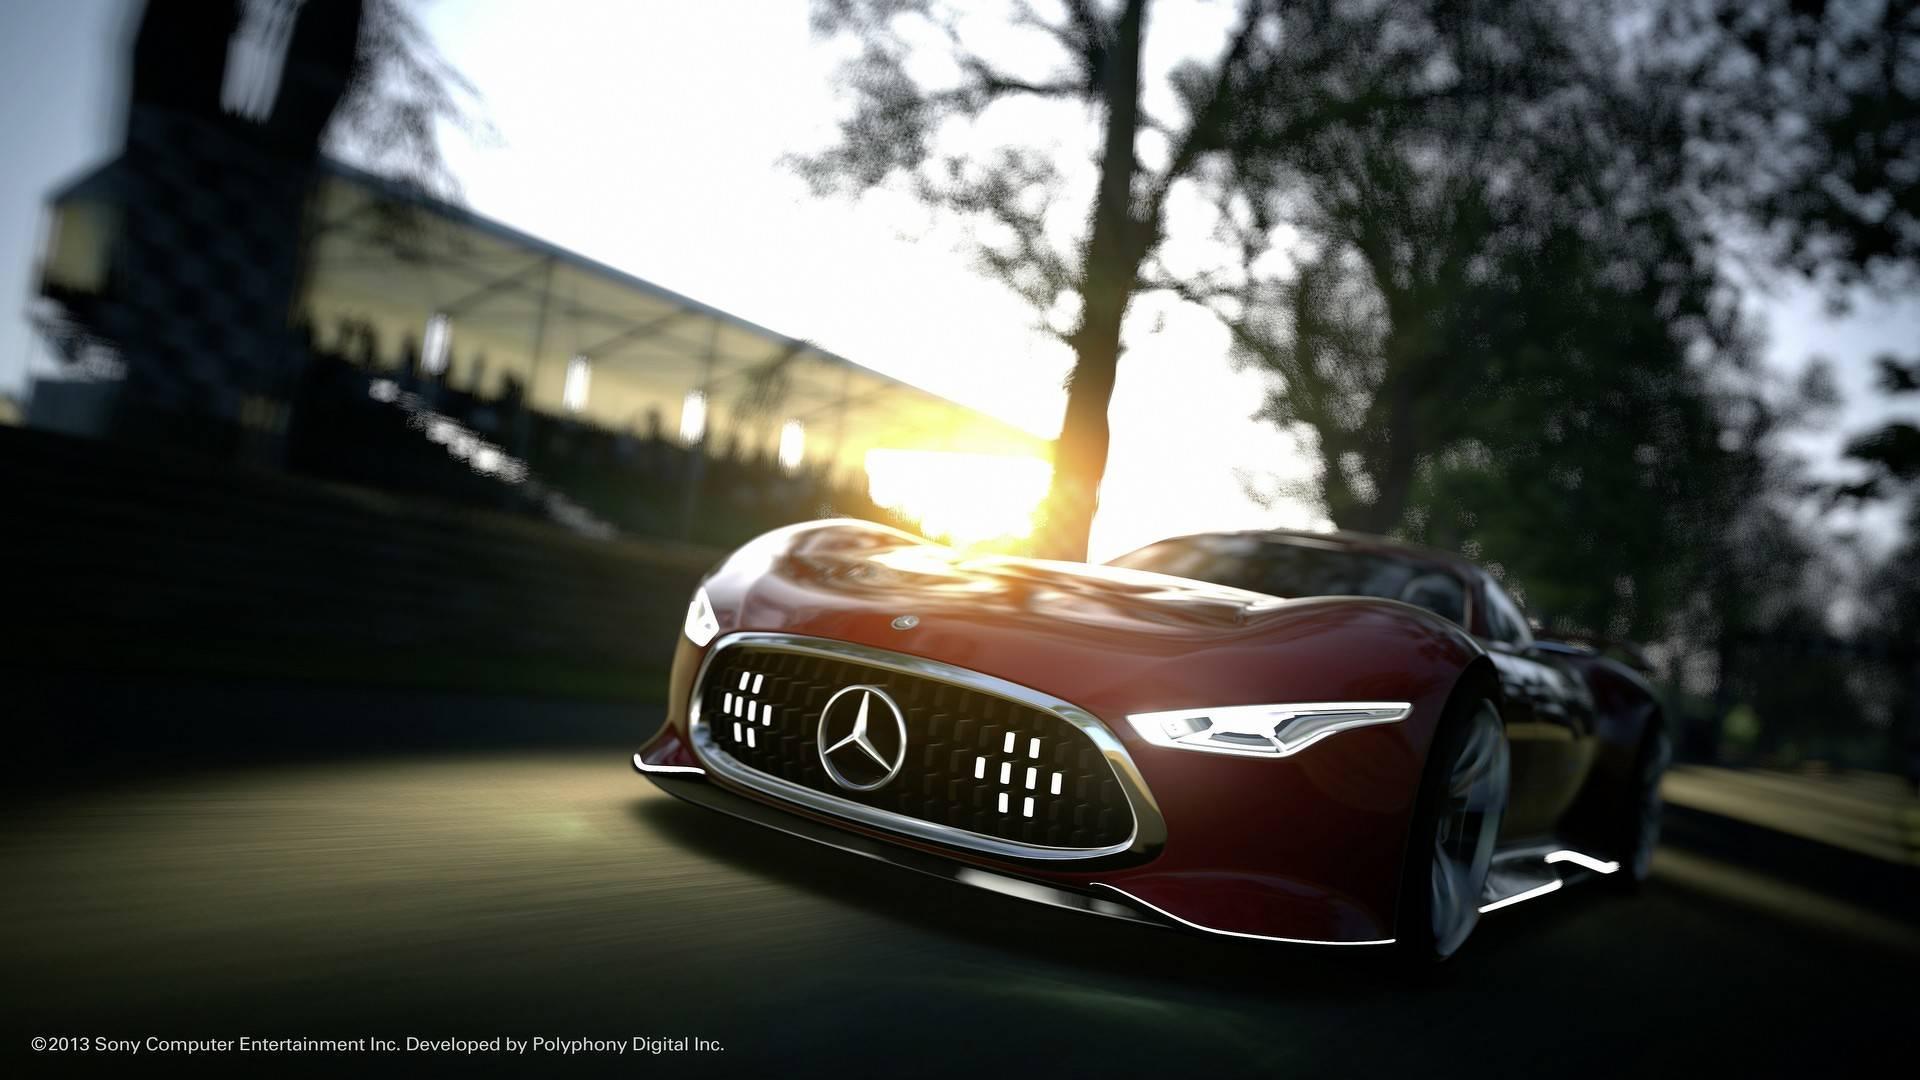 5a6831a15e081 2013 mercedes amg vision gran turismo مرسدس AMG Vision GT نقد و بررسی   اجاره ماشین